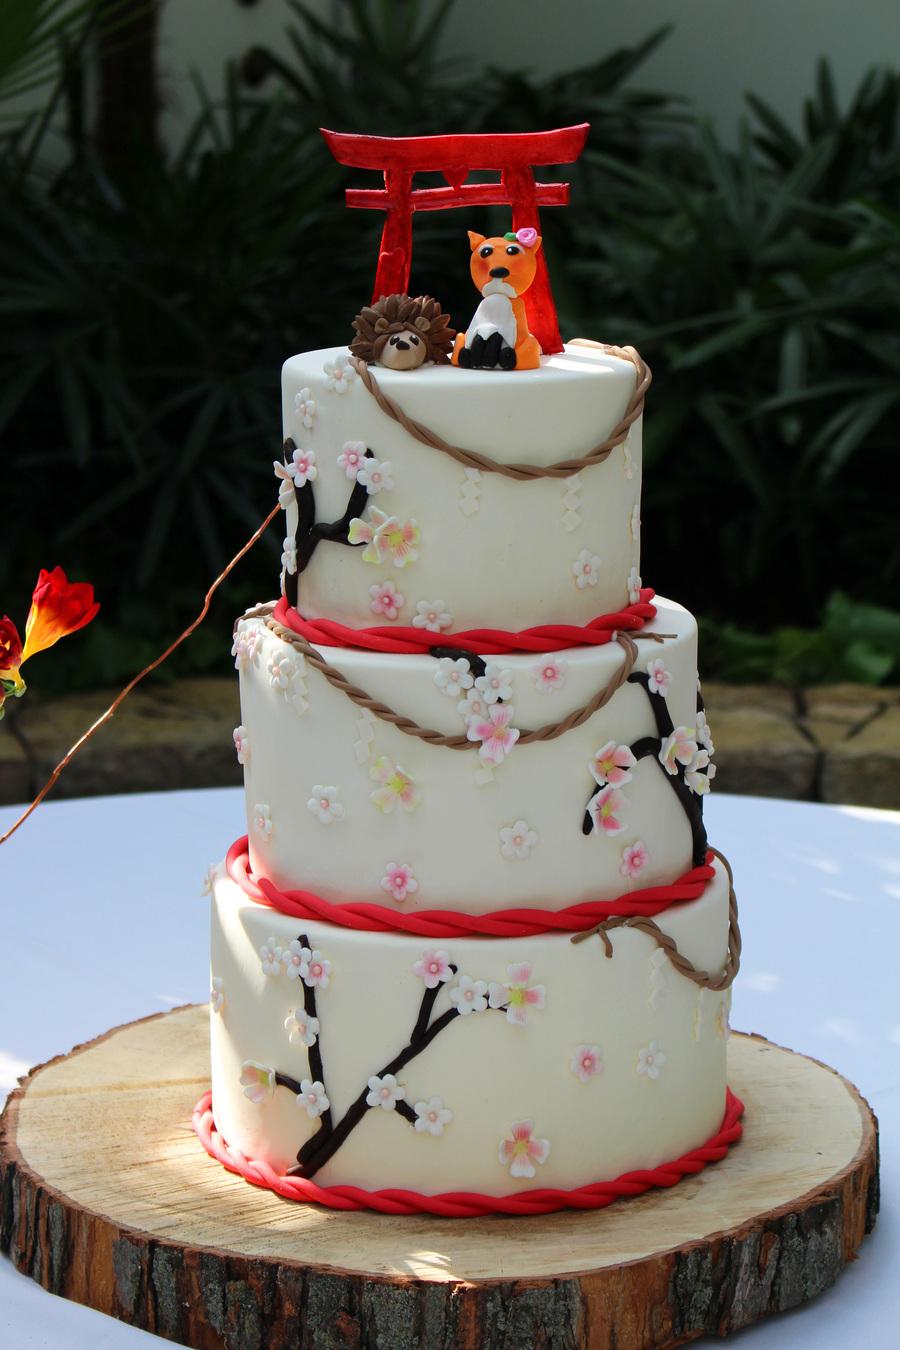 Japanese Wedding Cake With Handmade Fox Hedgehog And Torii Gate Topper